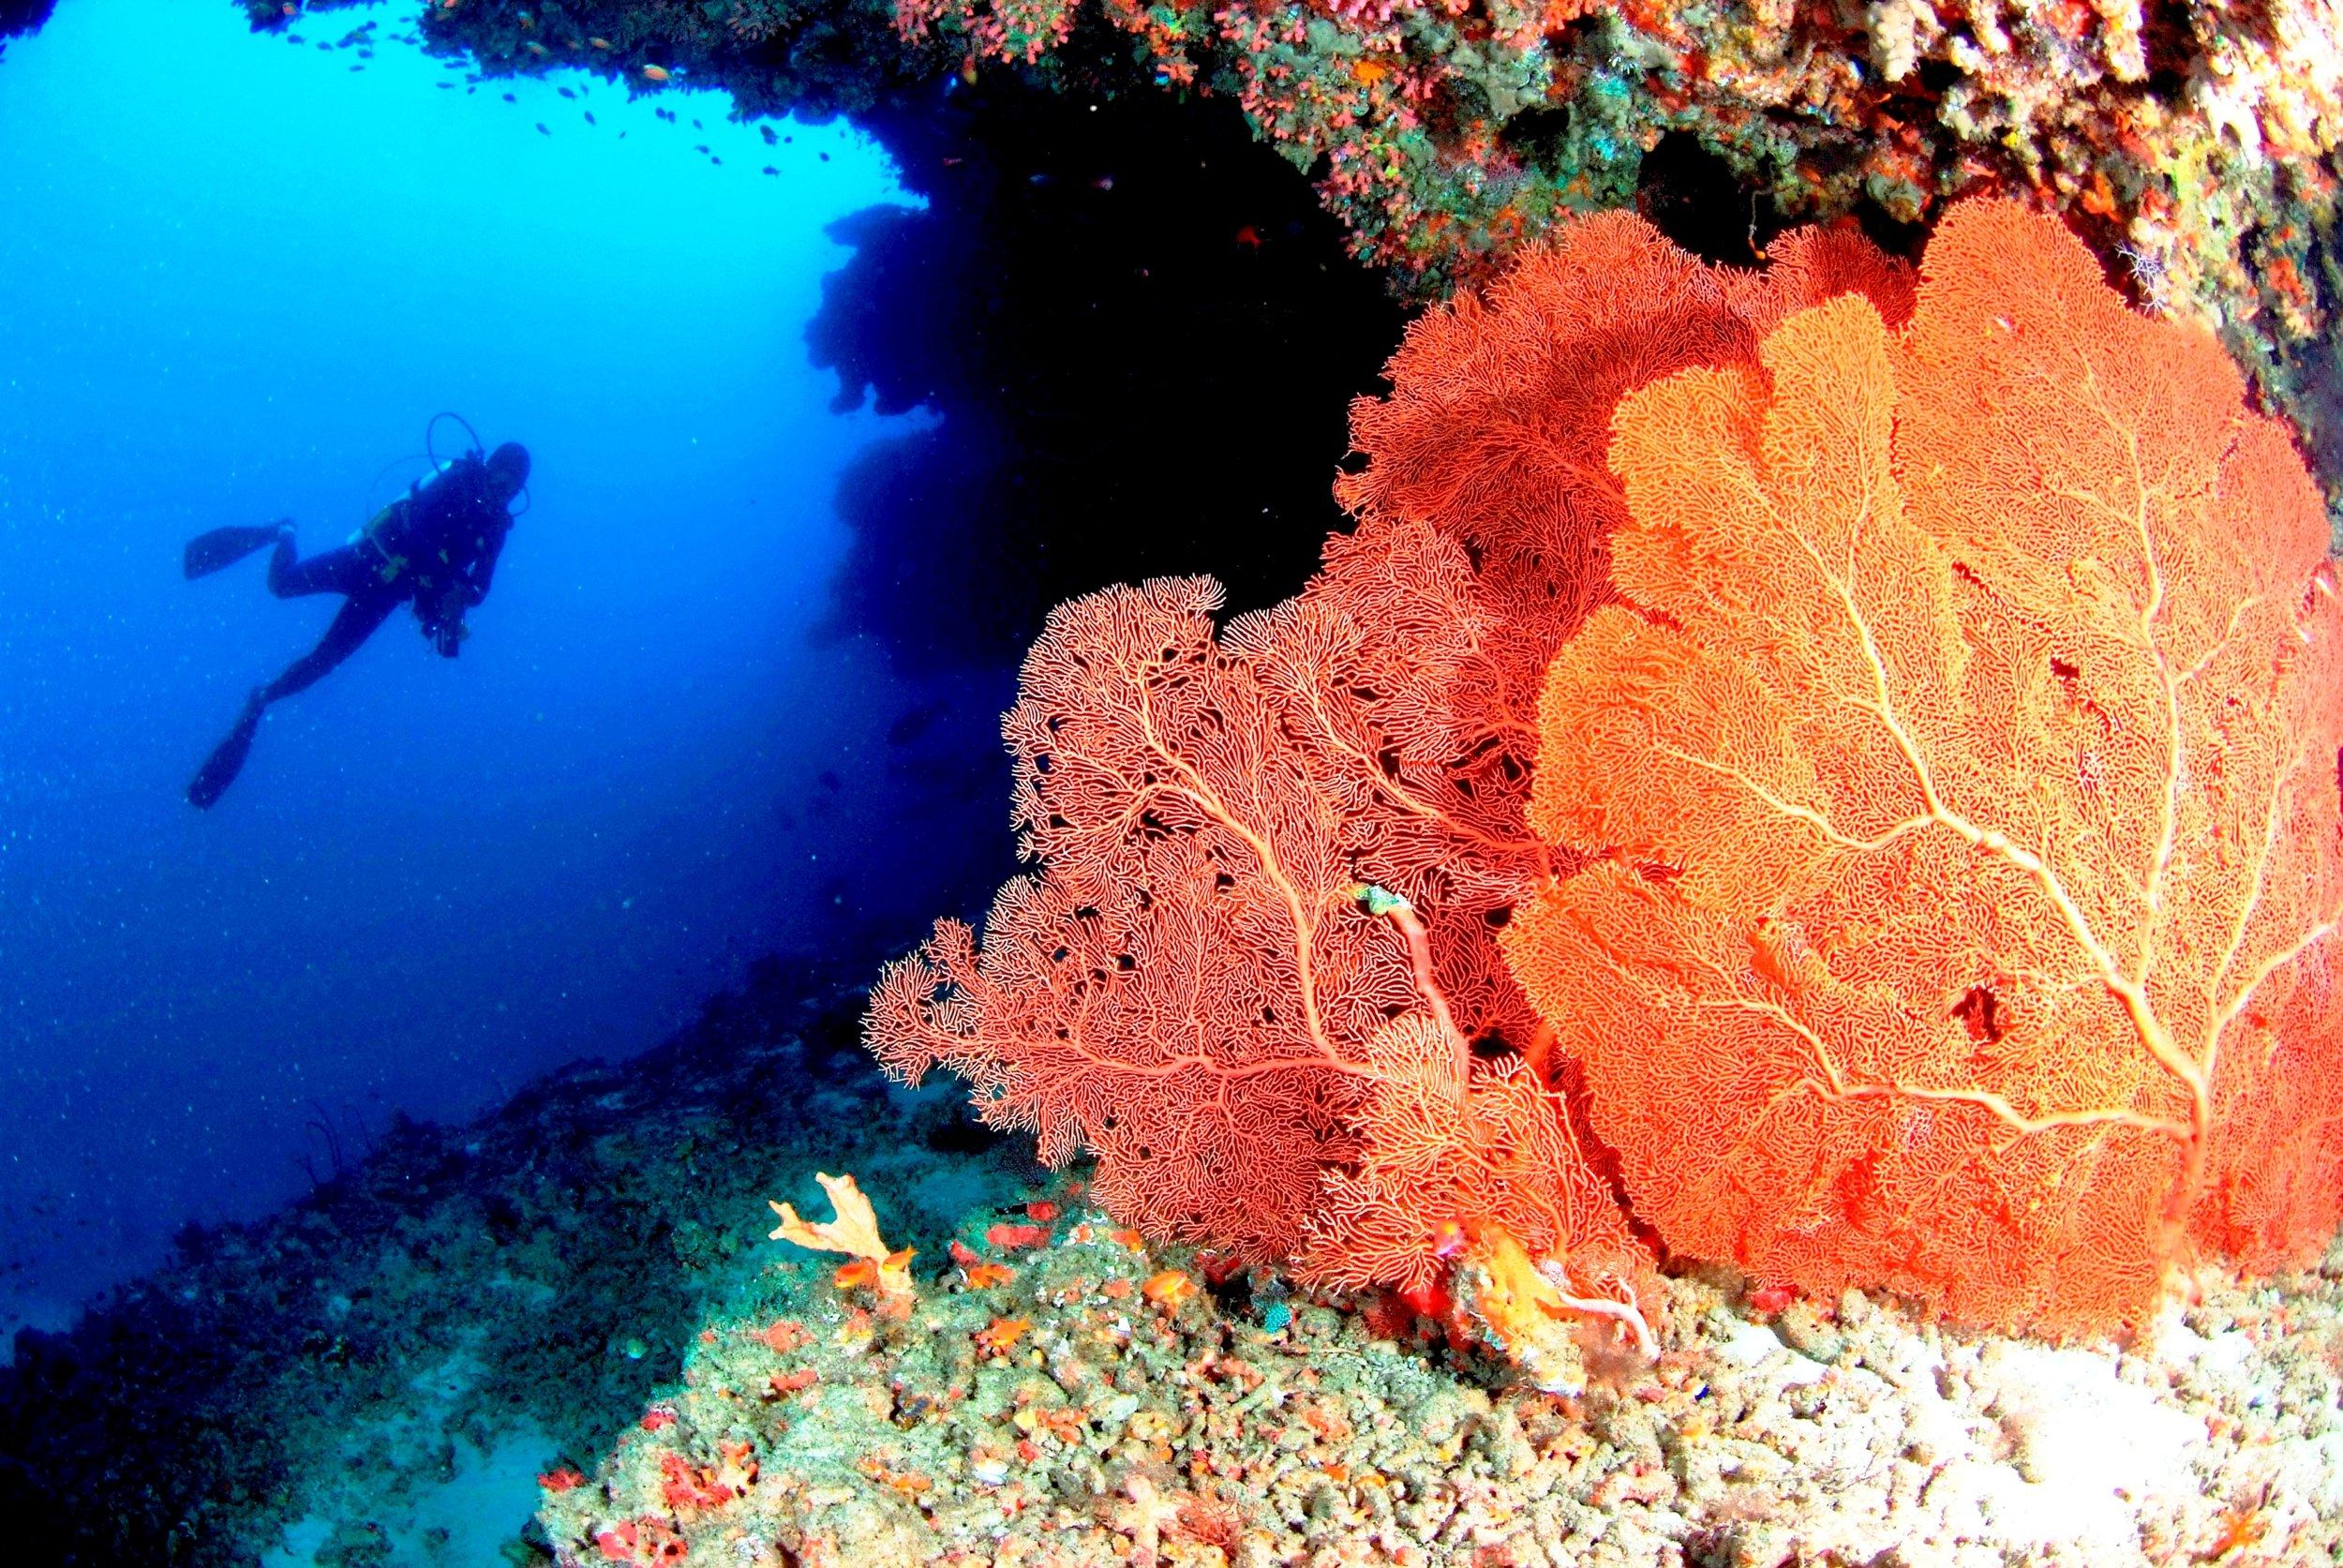 Anantara_Veli_Diving.JPG